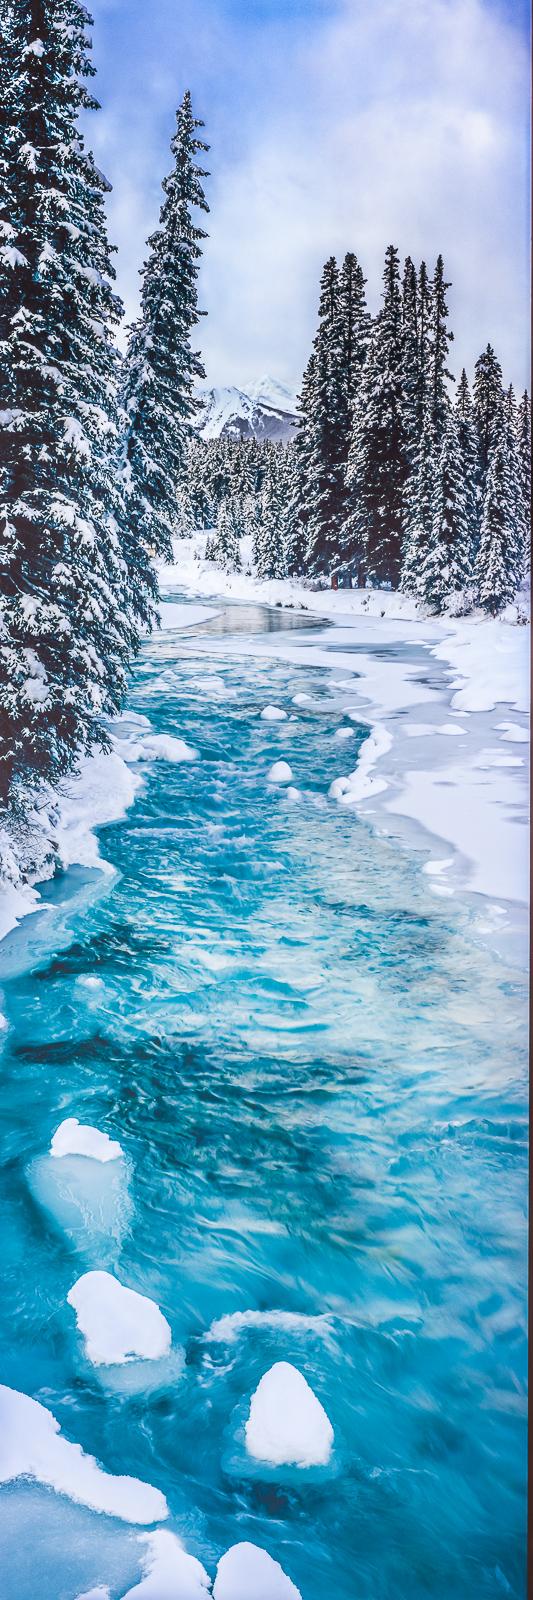 Bow River Blue,Grand Teton National Park, Wyoming,light,panoramic,horizontal,water, photo